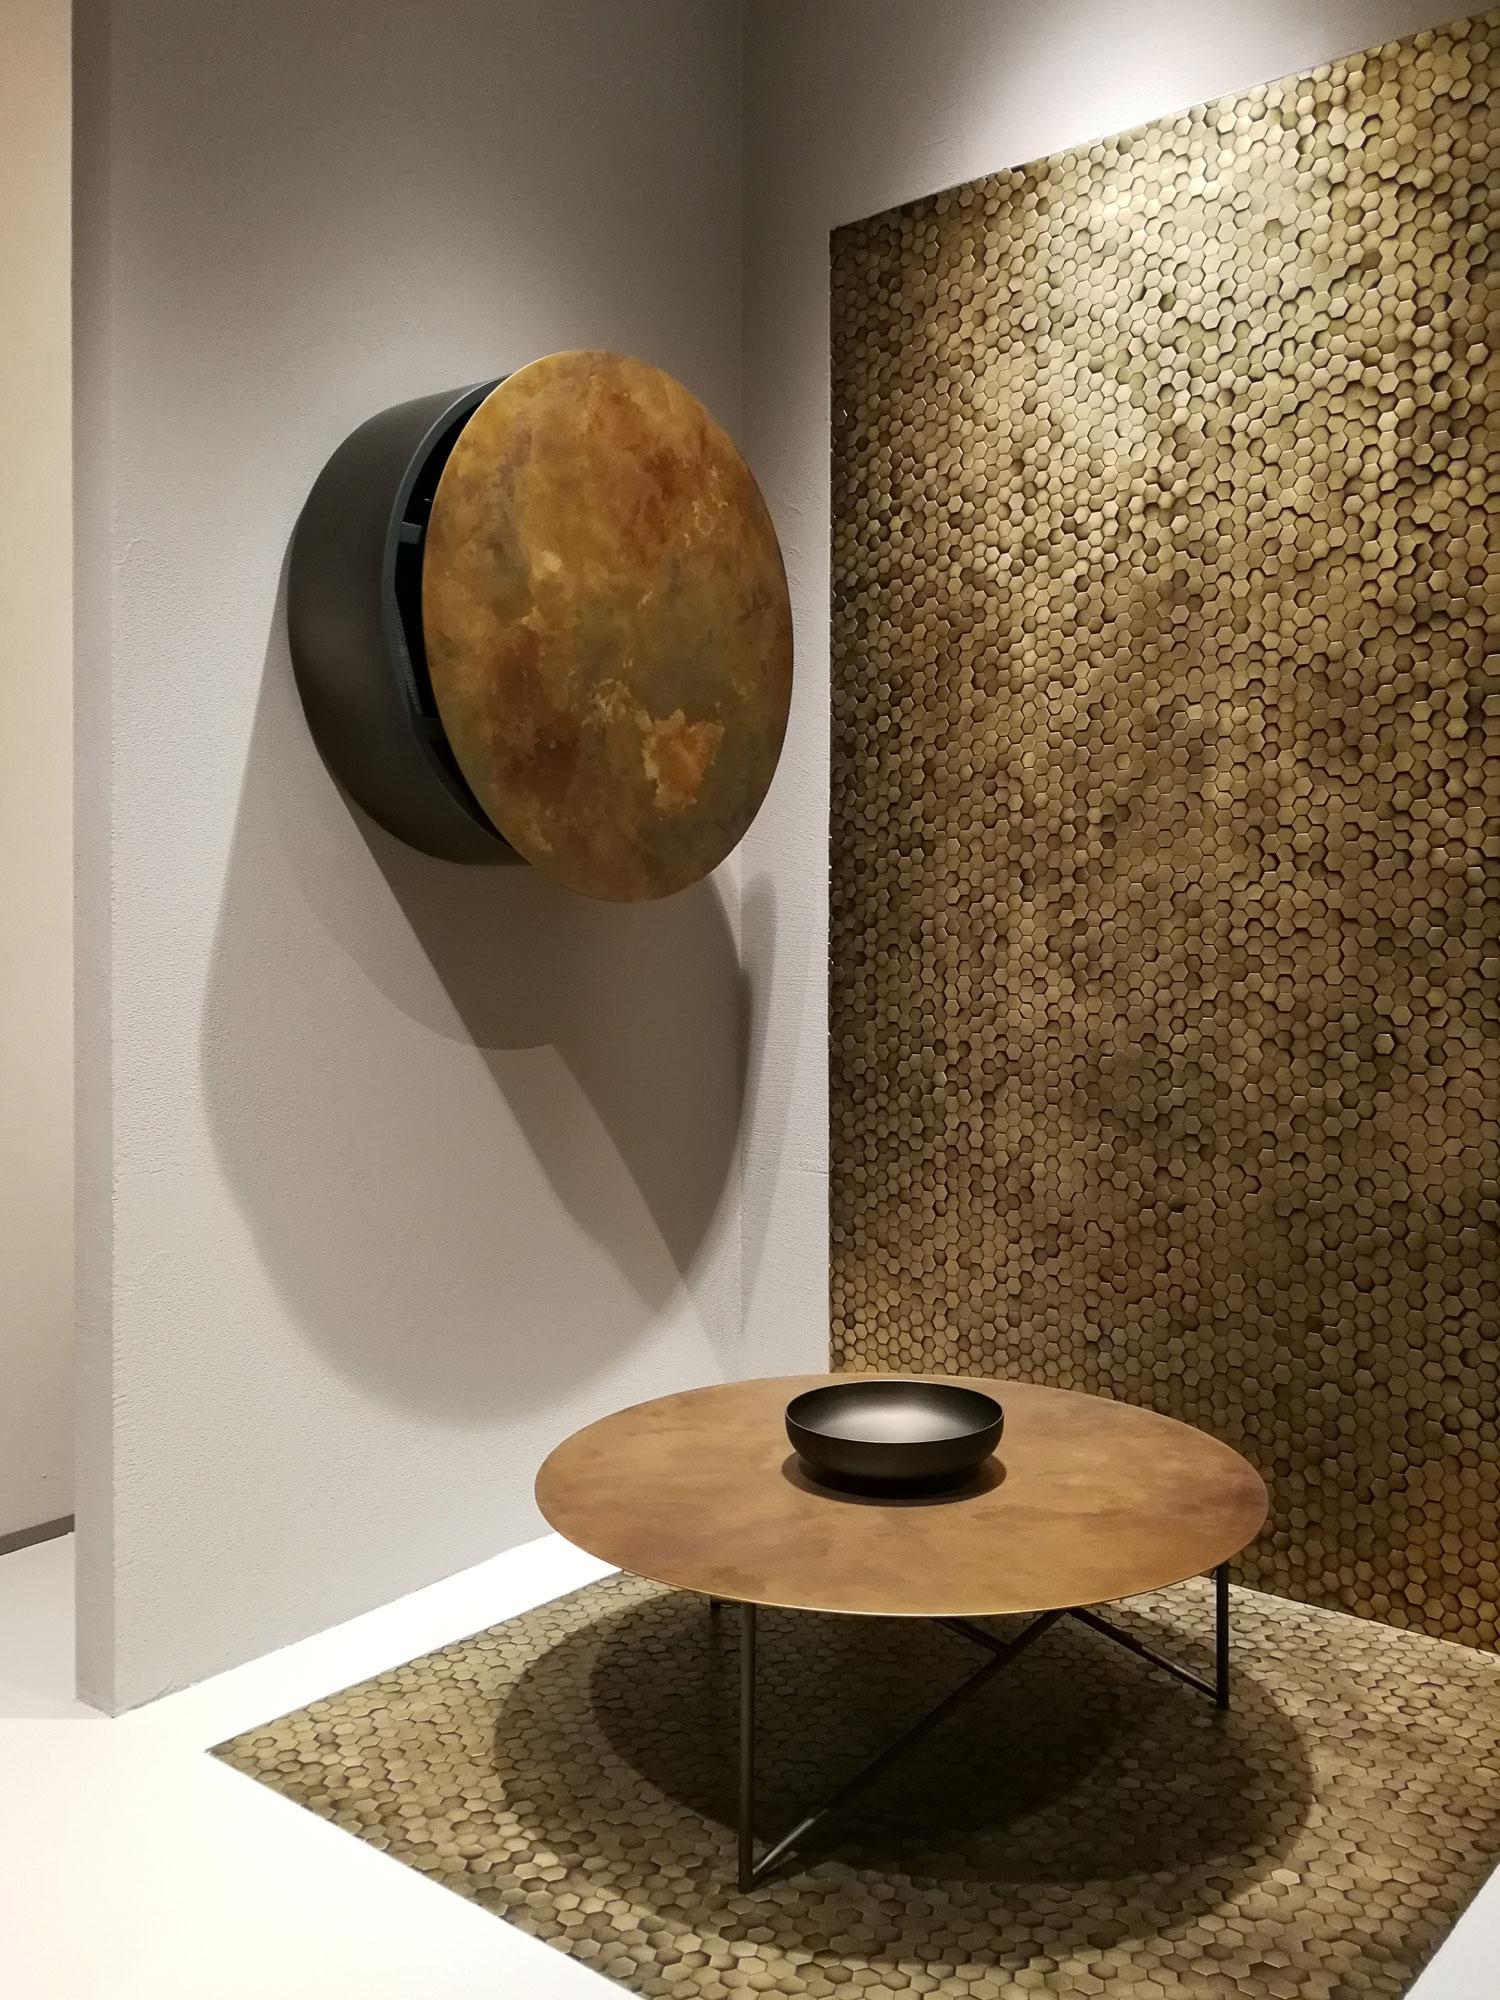 Interior design trends for 2020_Interior design trends 2020_metals in interior design _Authentic Interior design blog